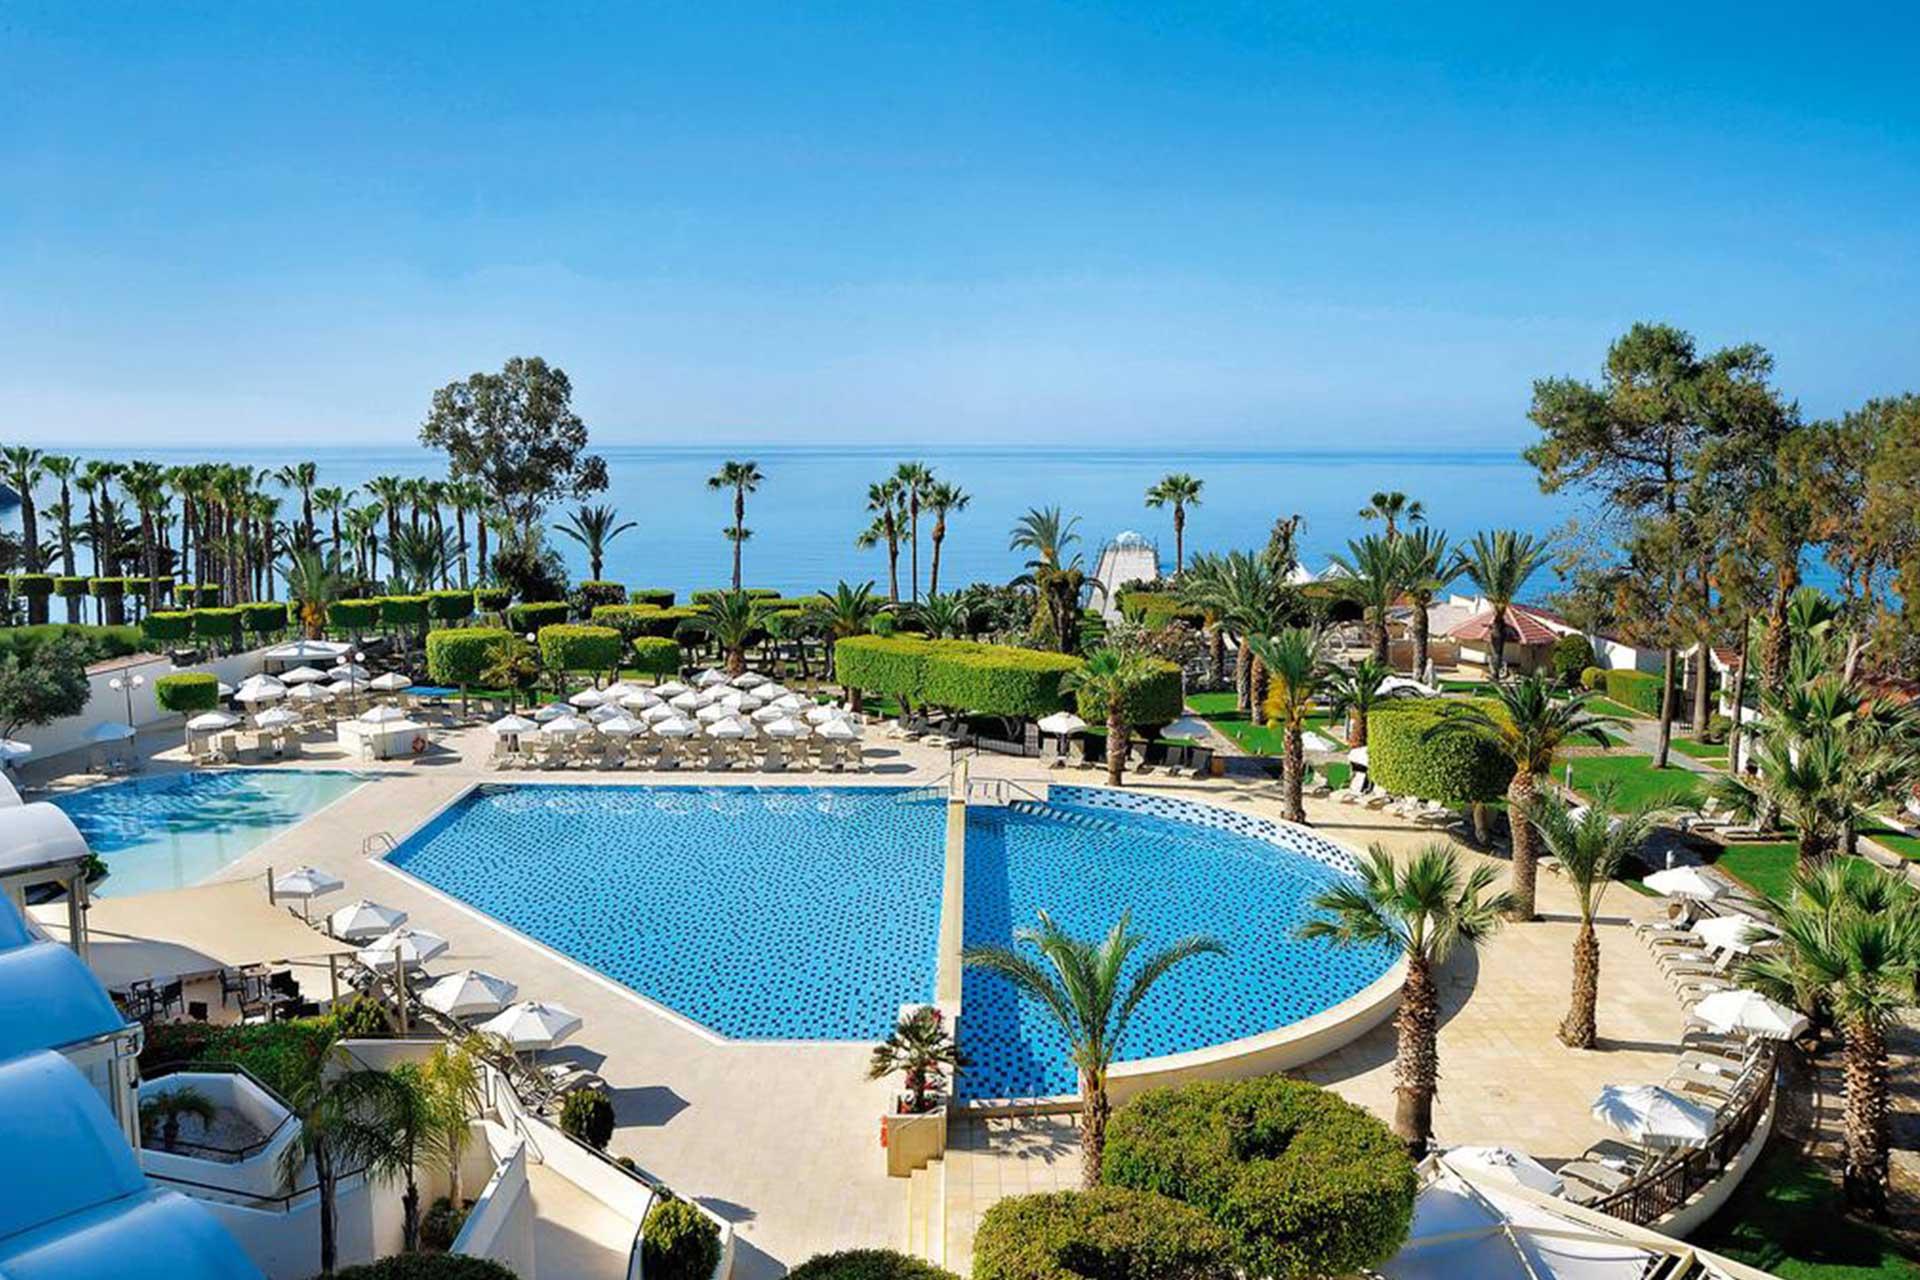 ELEMEC GBC - Projects, Elias Beach Hotel